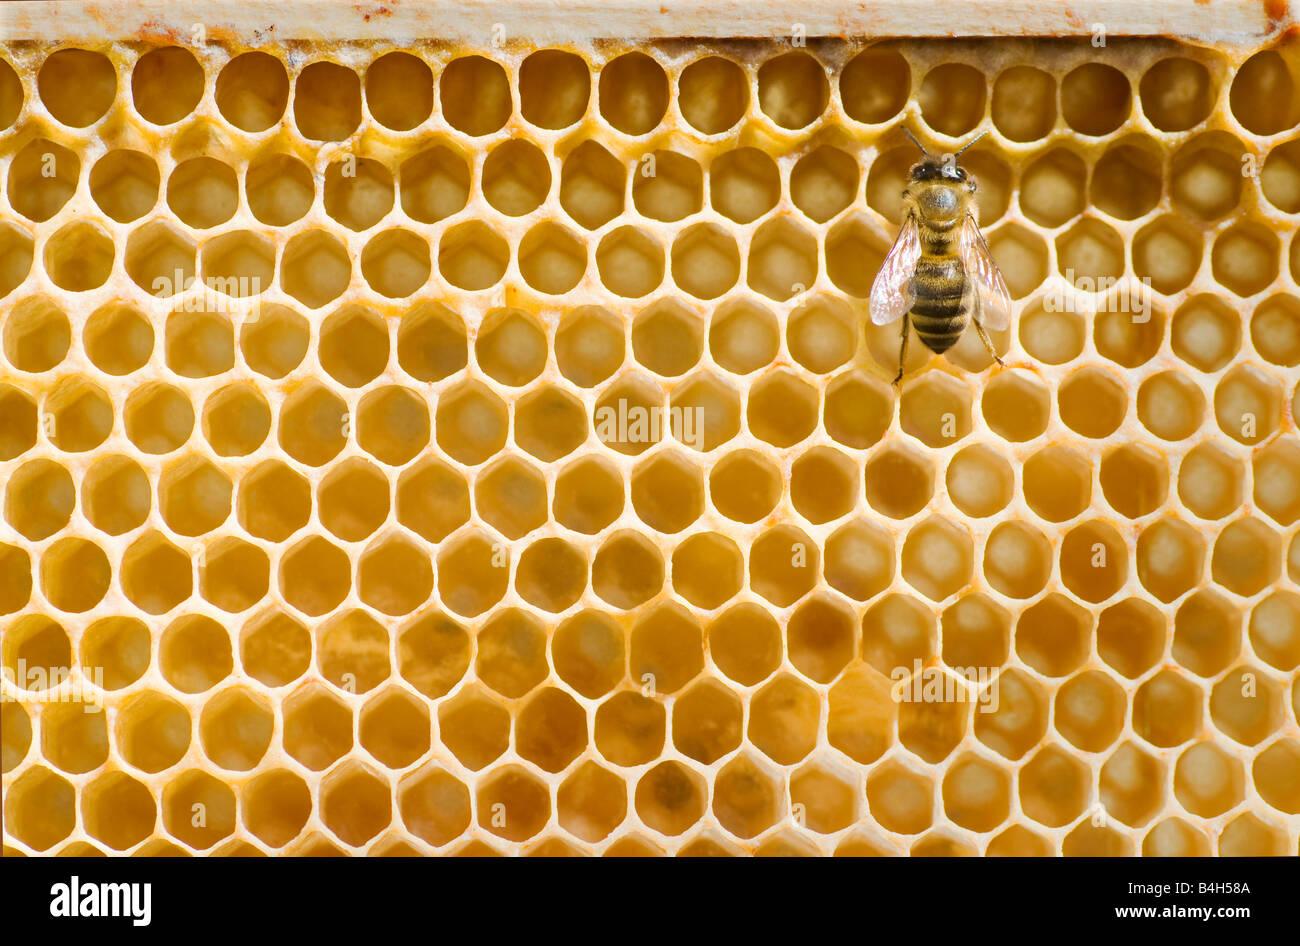 Honeybee on a comb - Stock Image